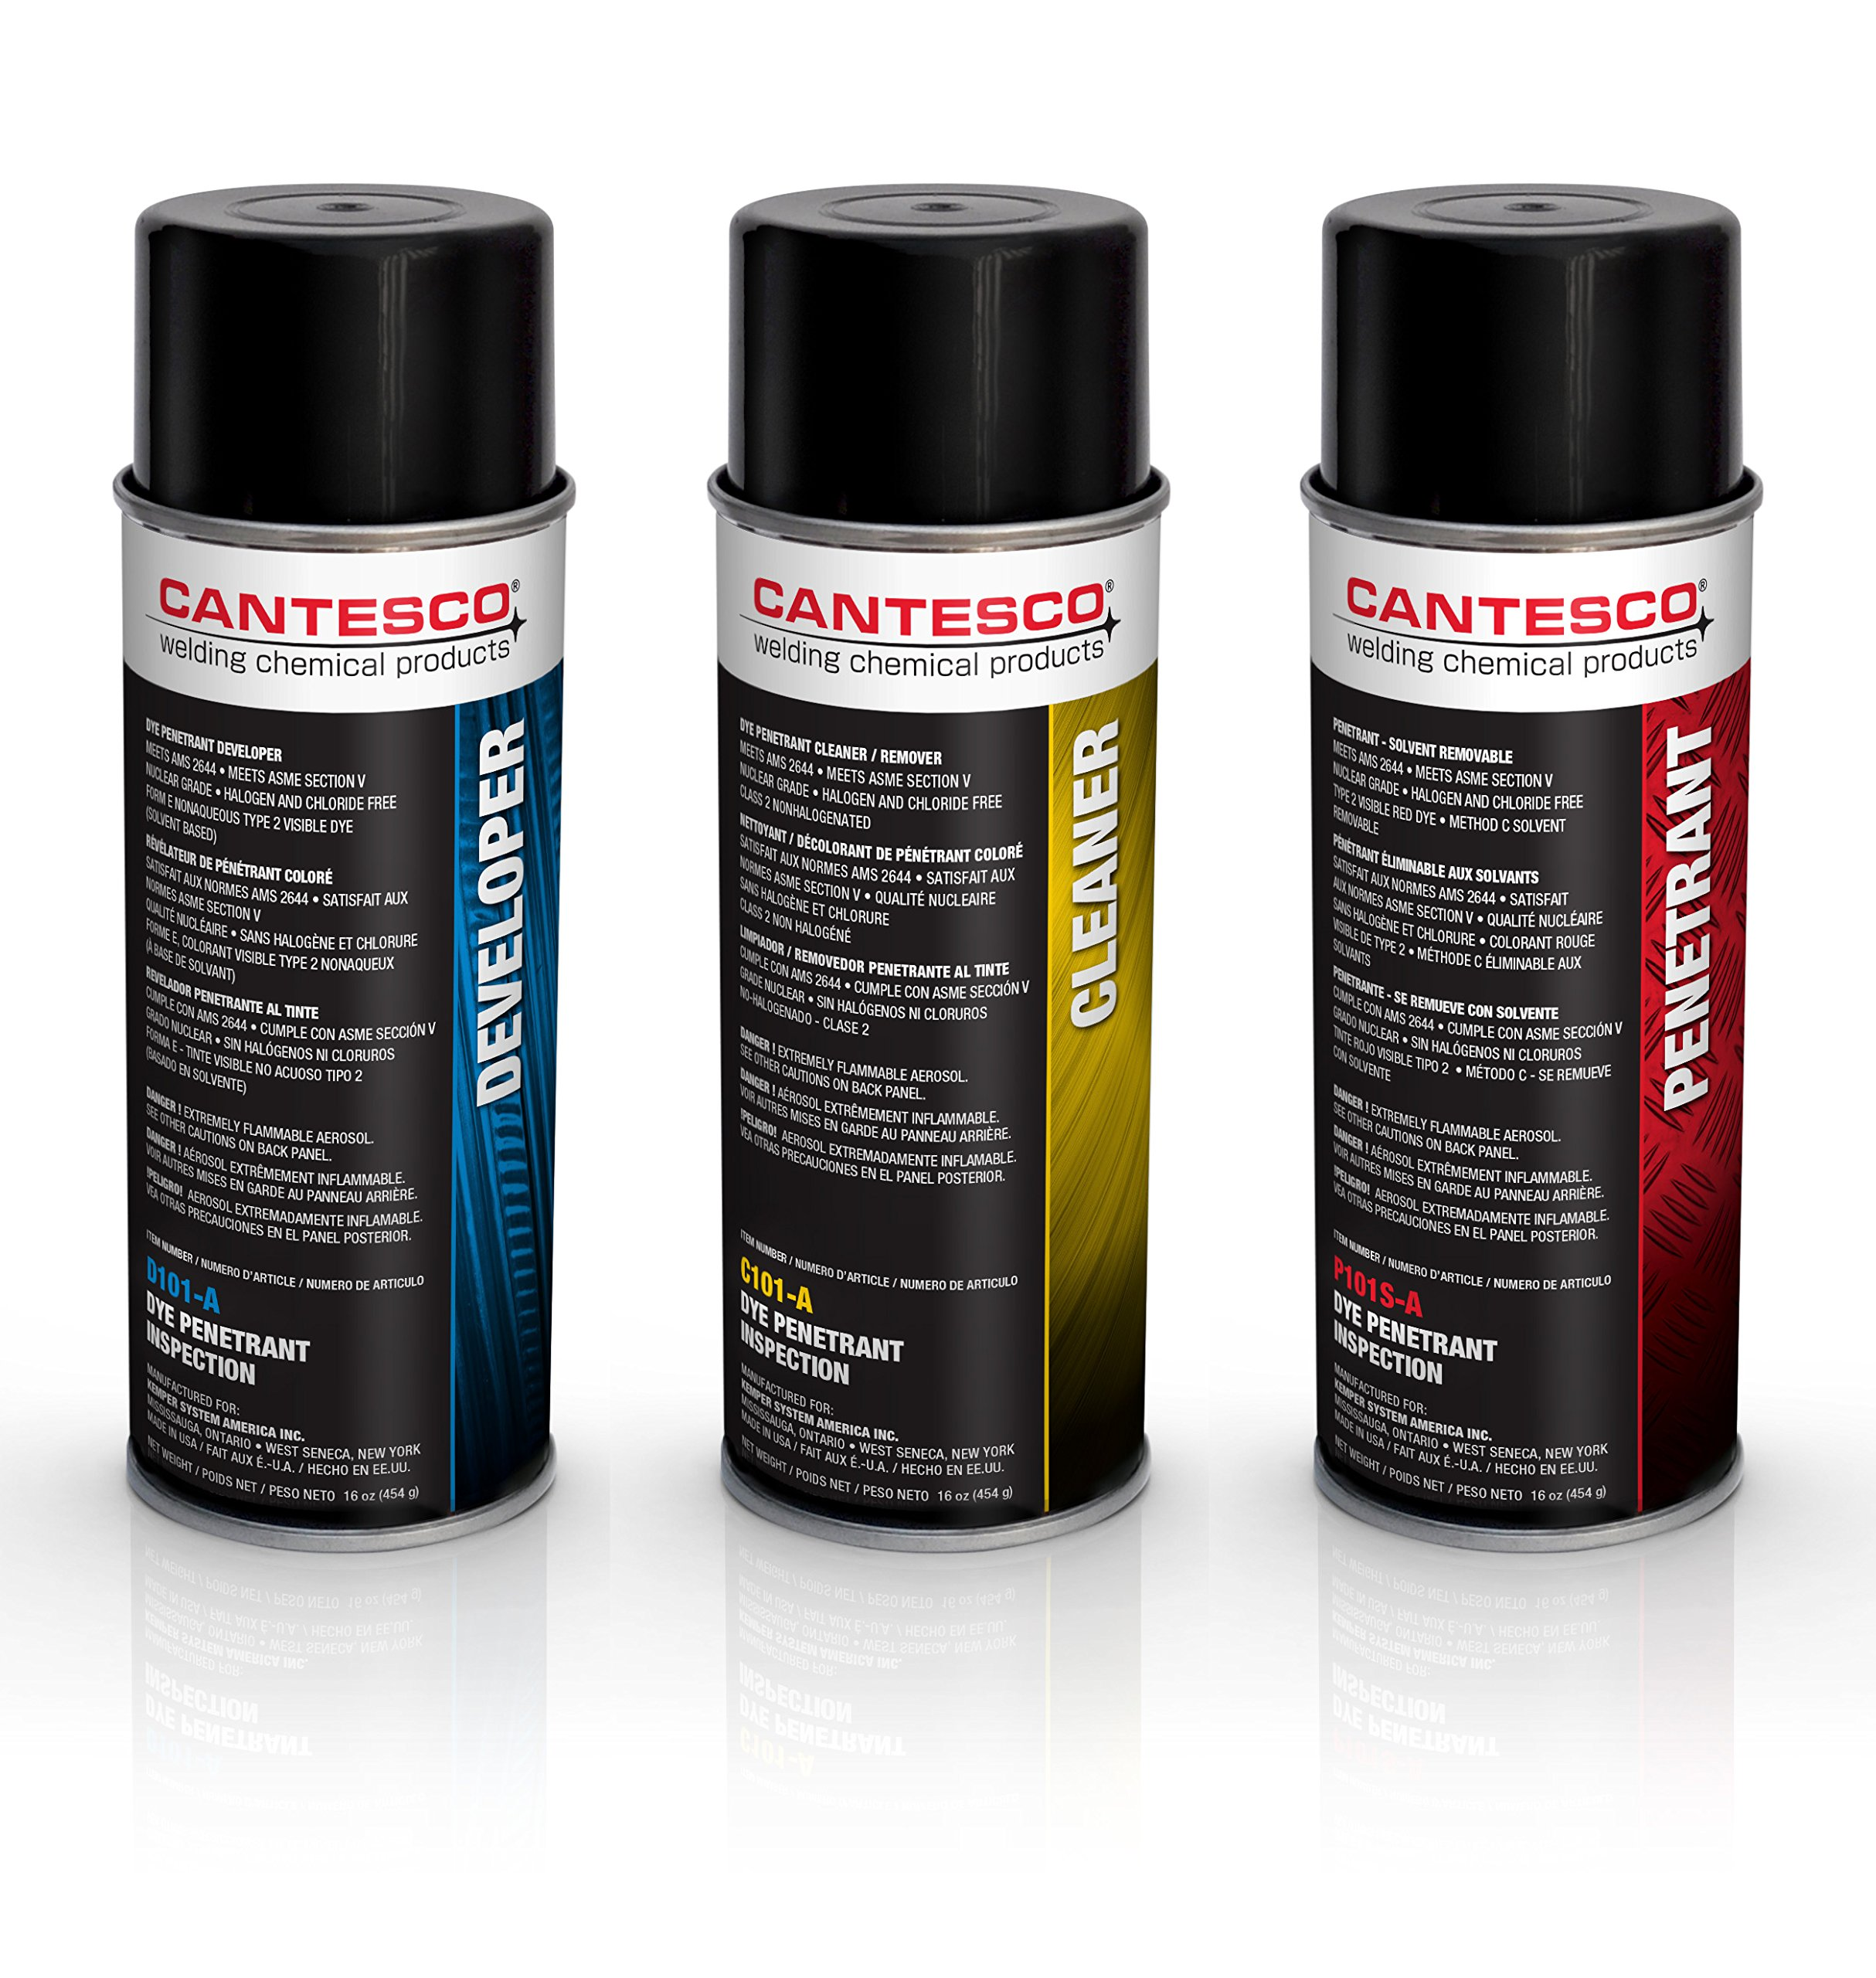 CANTESCO K801S Dye Penetrant Kit, Solvent Removable, 8 Can Kit